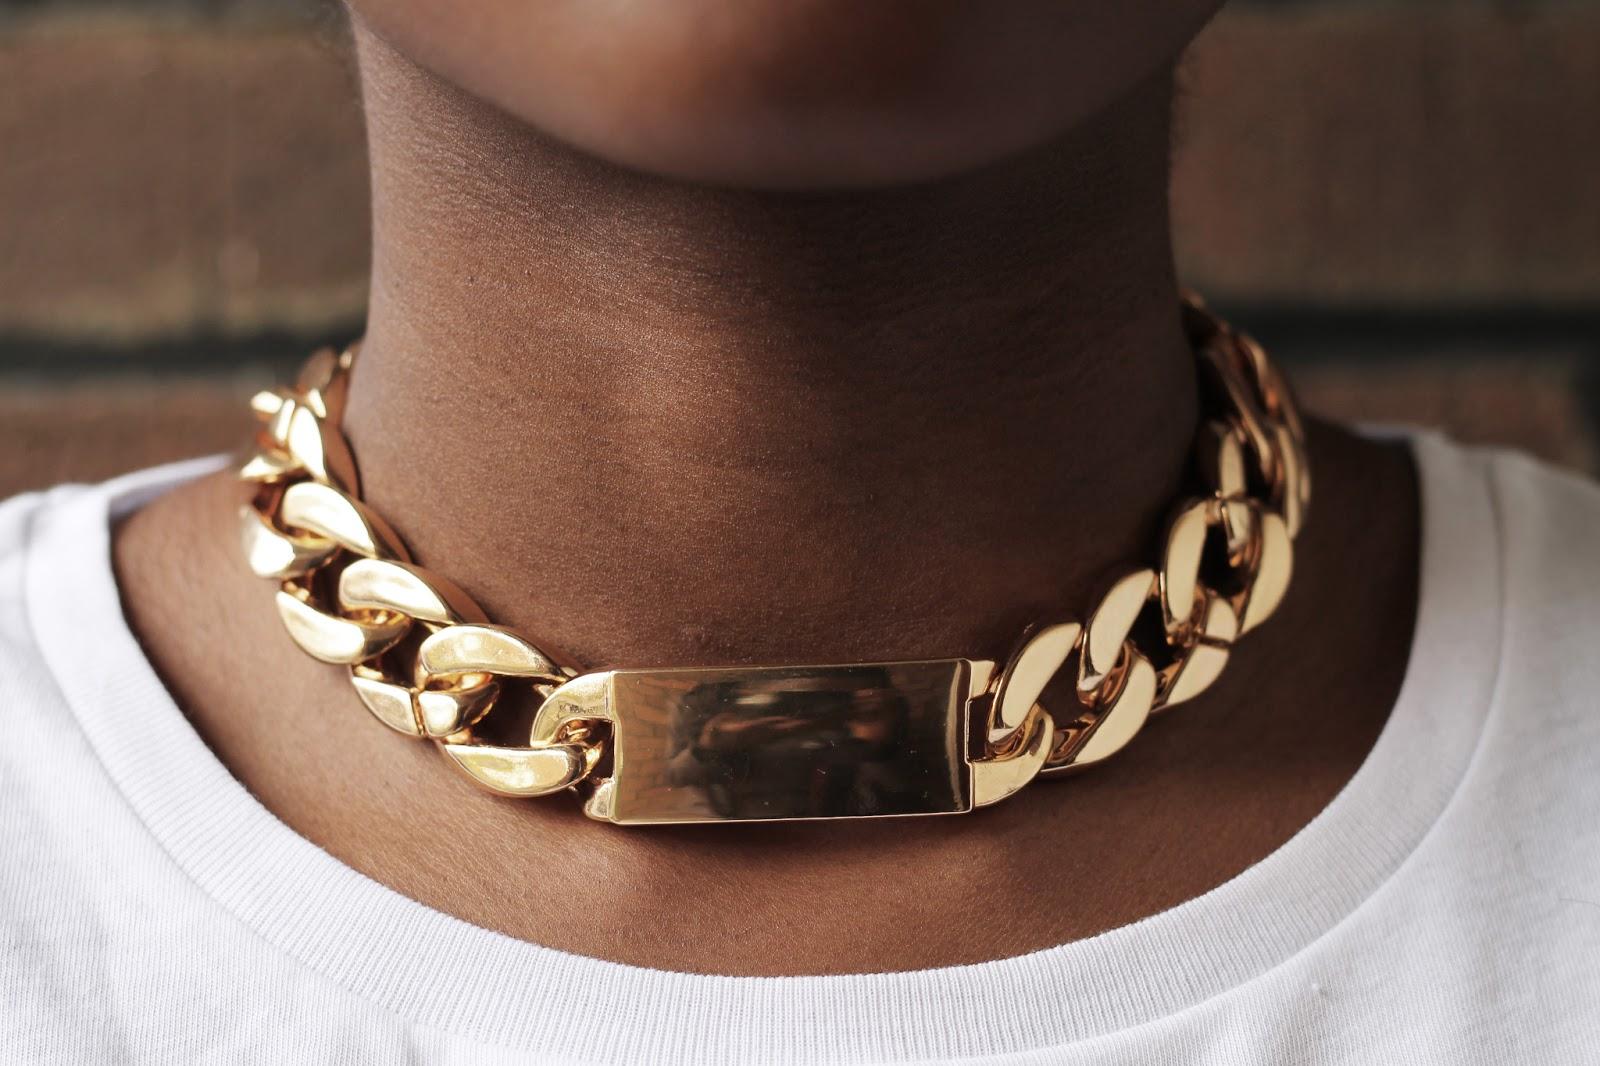 Celine Inspired Necklace Celine id Necklace